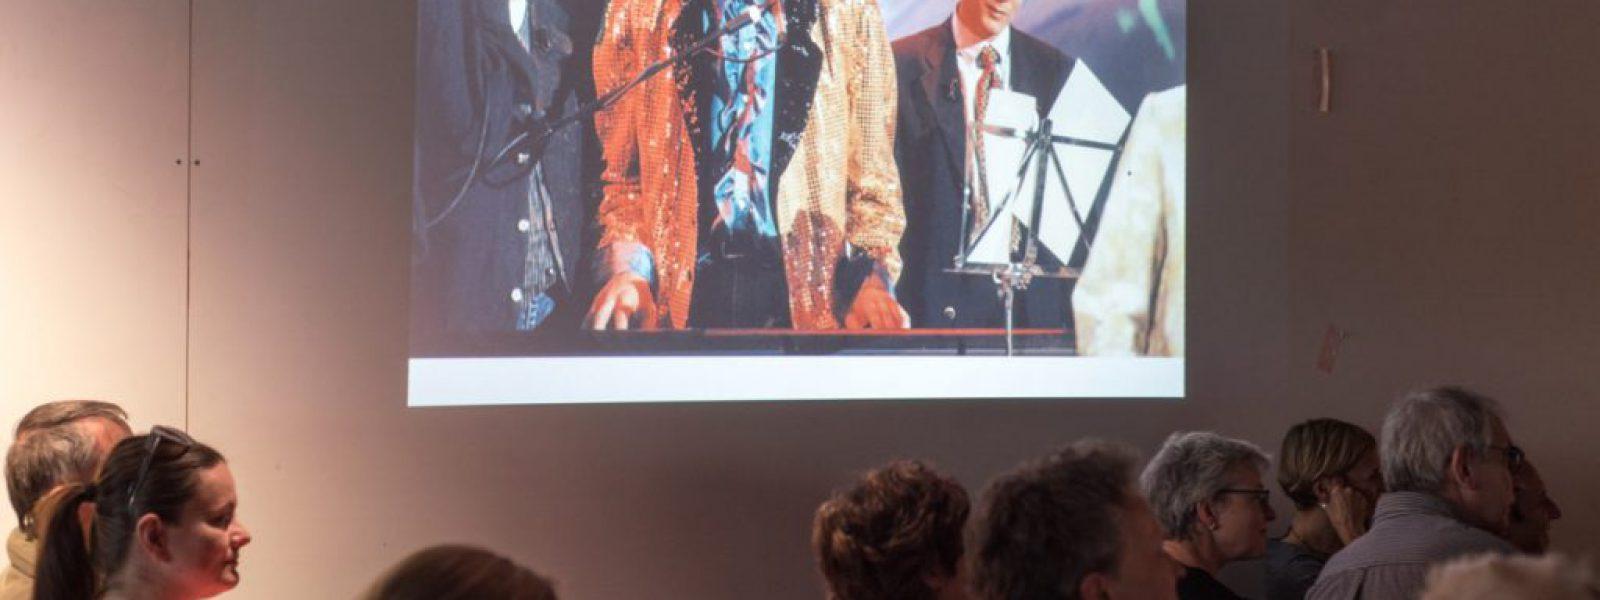 LNDM 2019 FCSPMuseum (Sabrina A Nagel) - 37